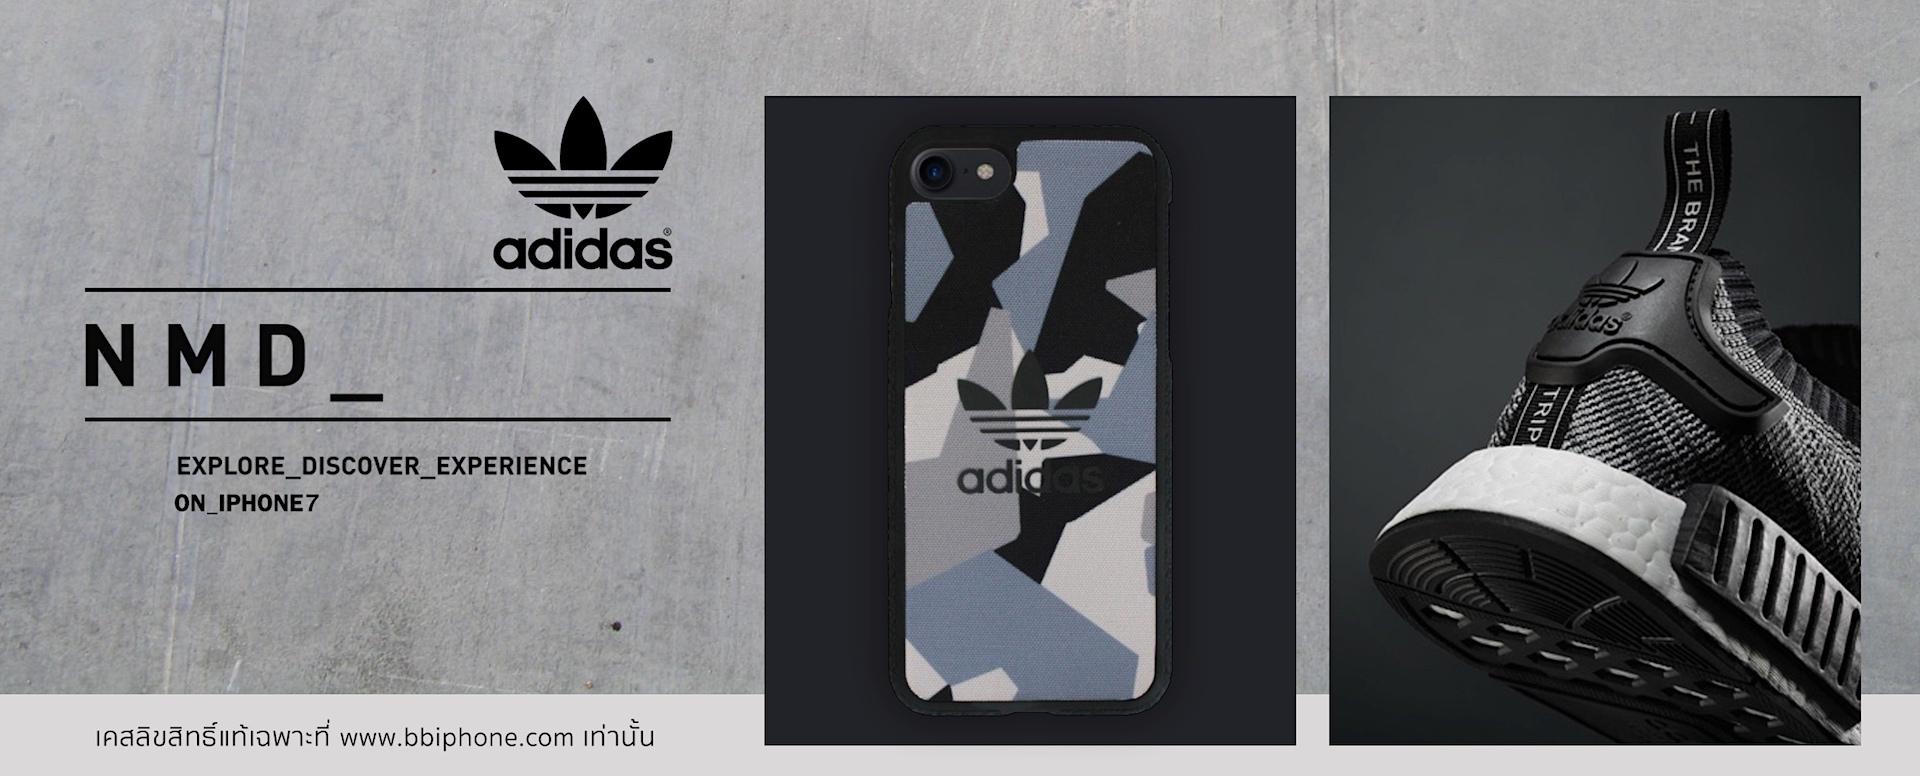 adidas-nmd-iphone-7